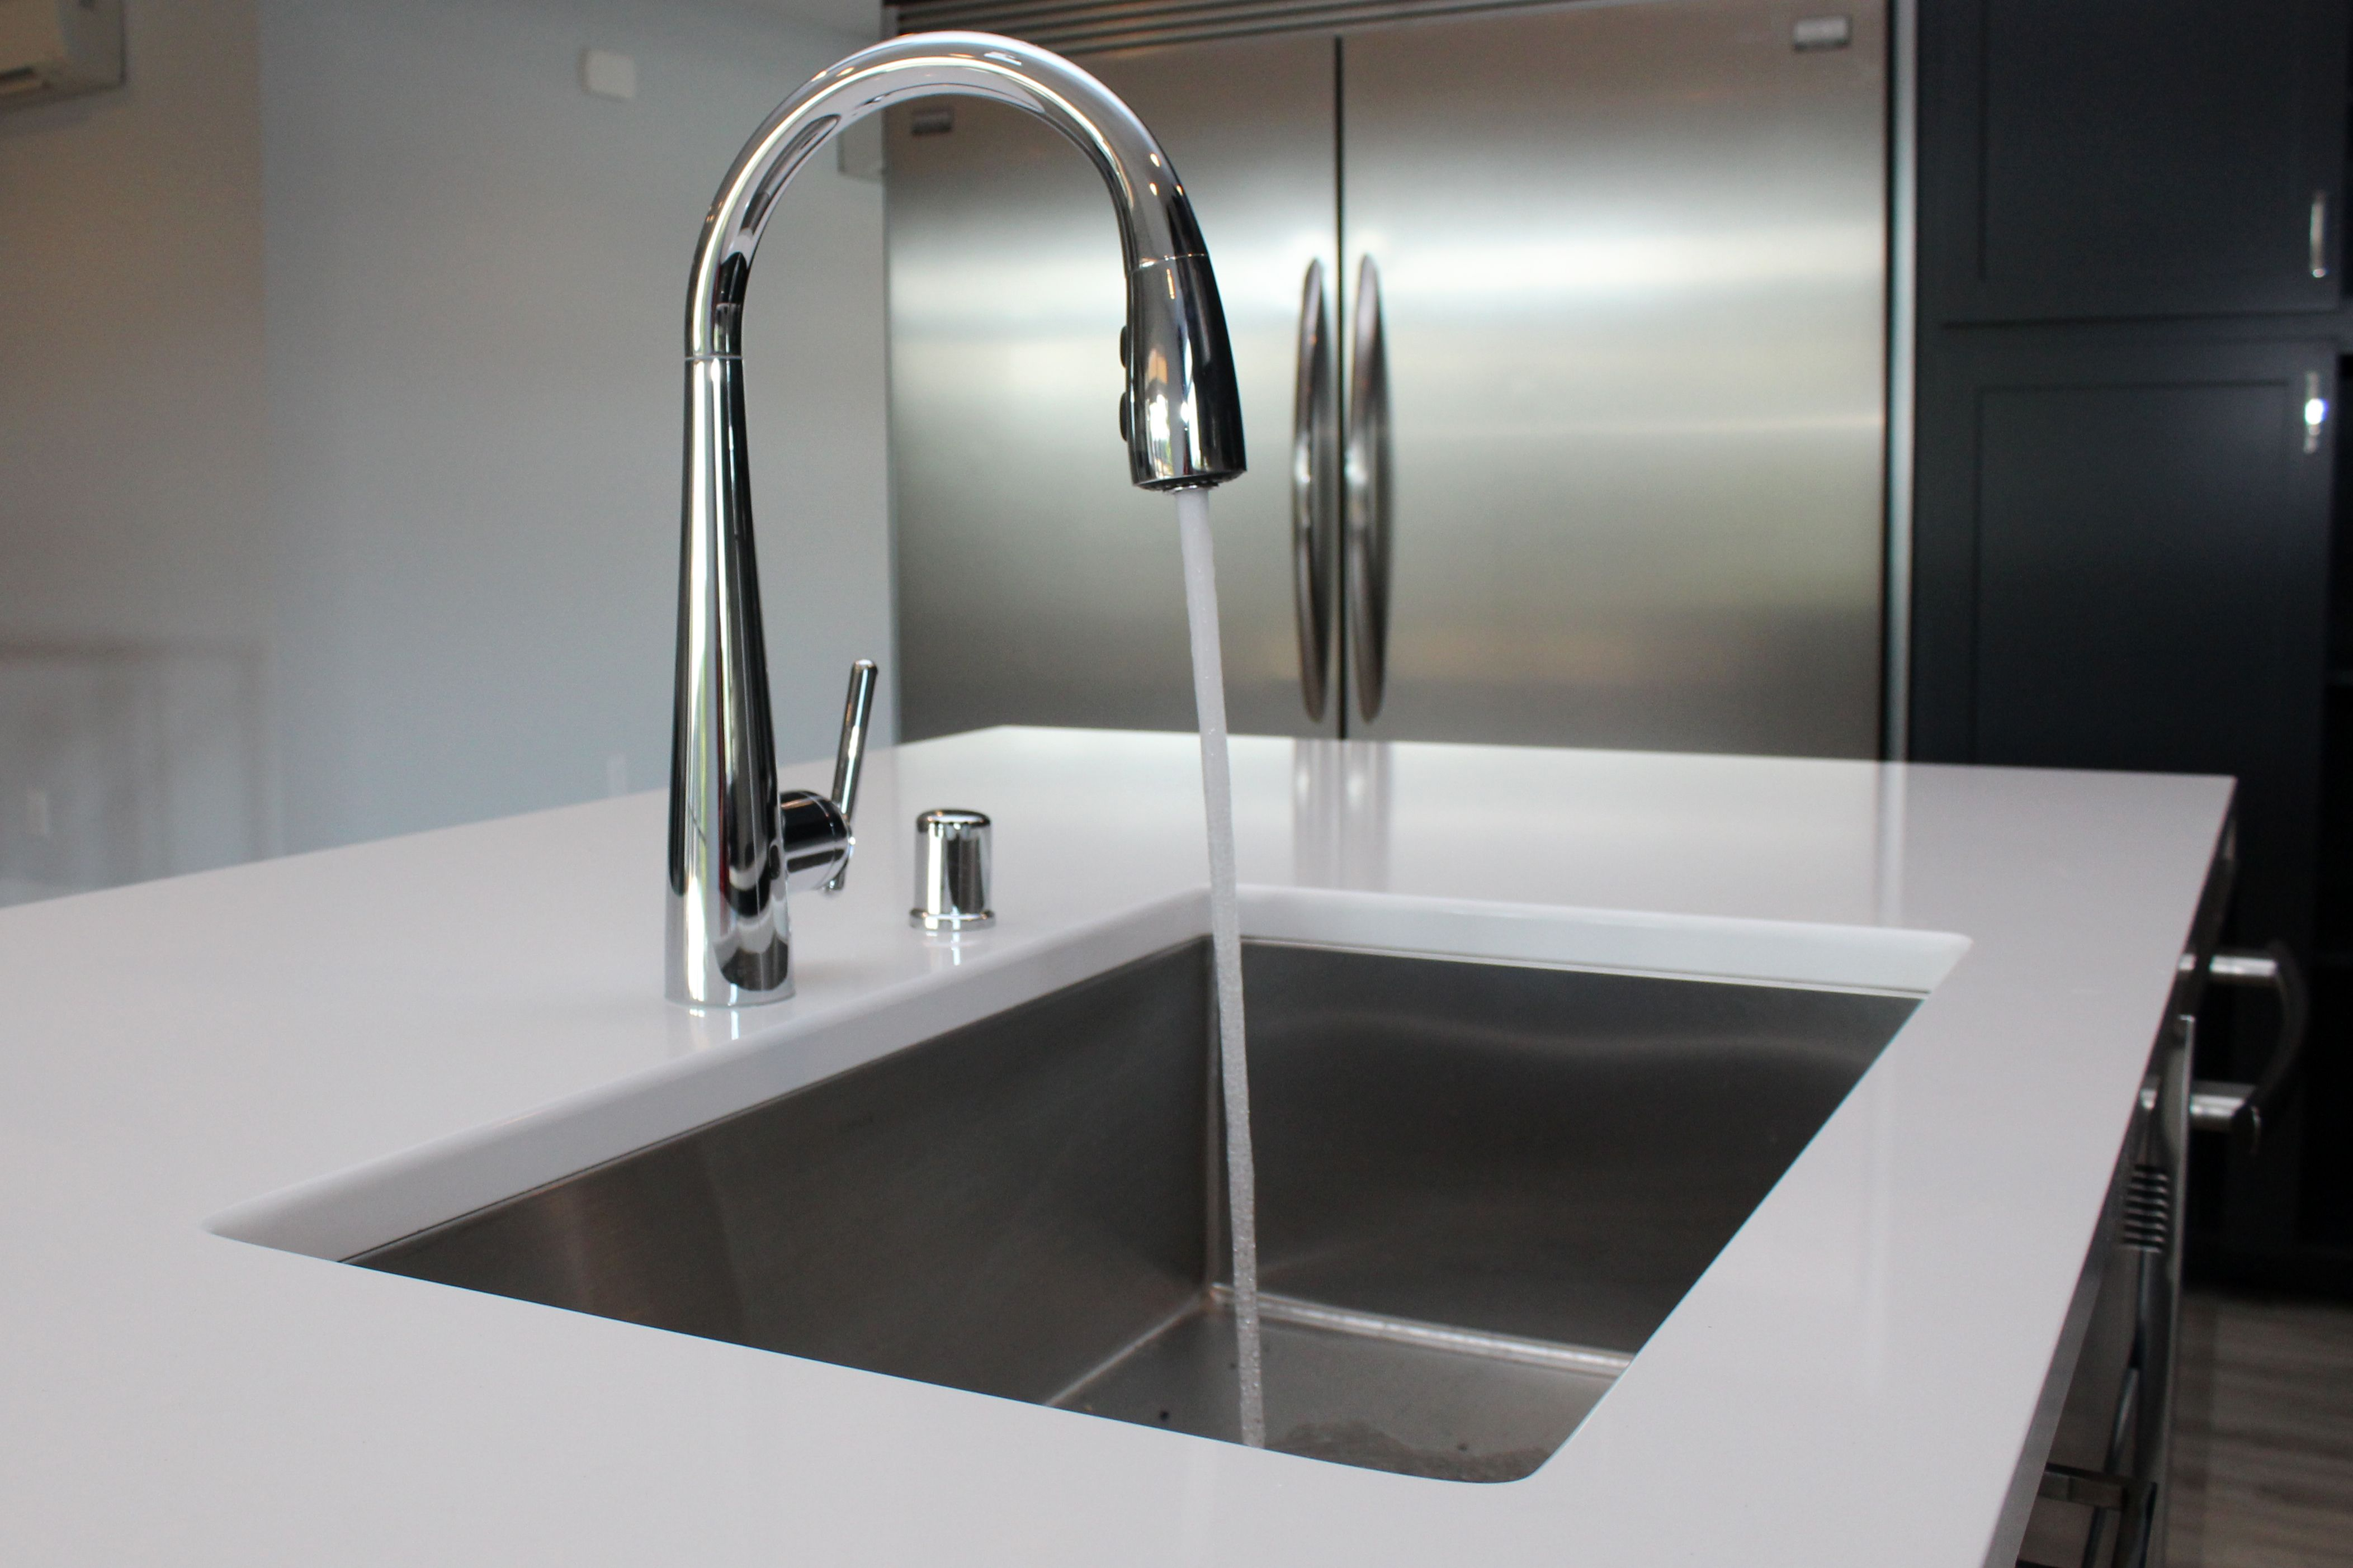 white kitchen sink undermount aid ovens quartz counter with stainless steel